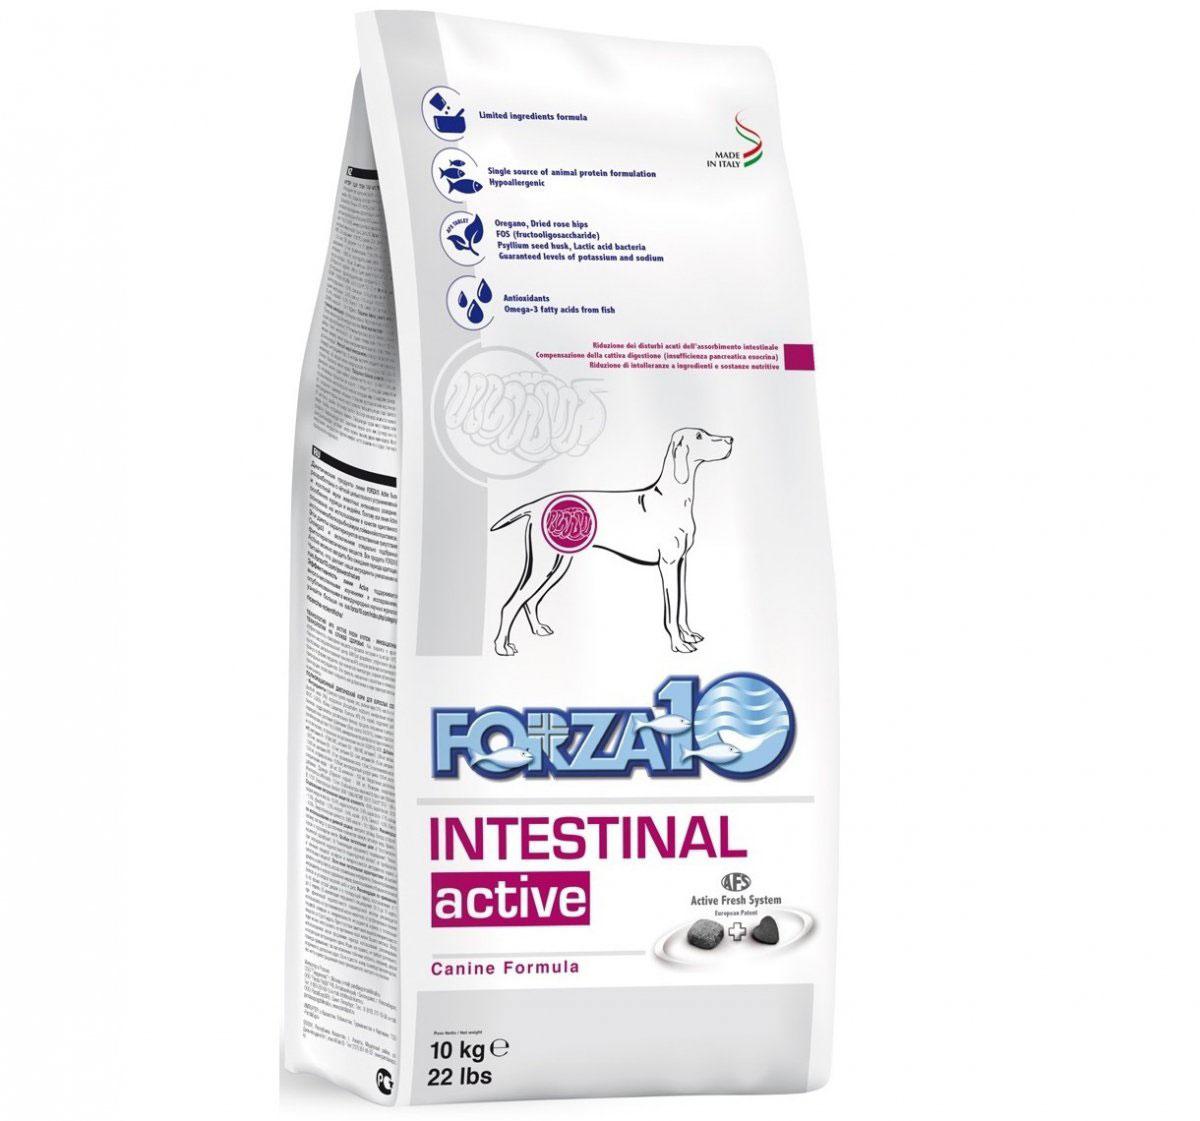 Forza10 intestinal